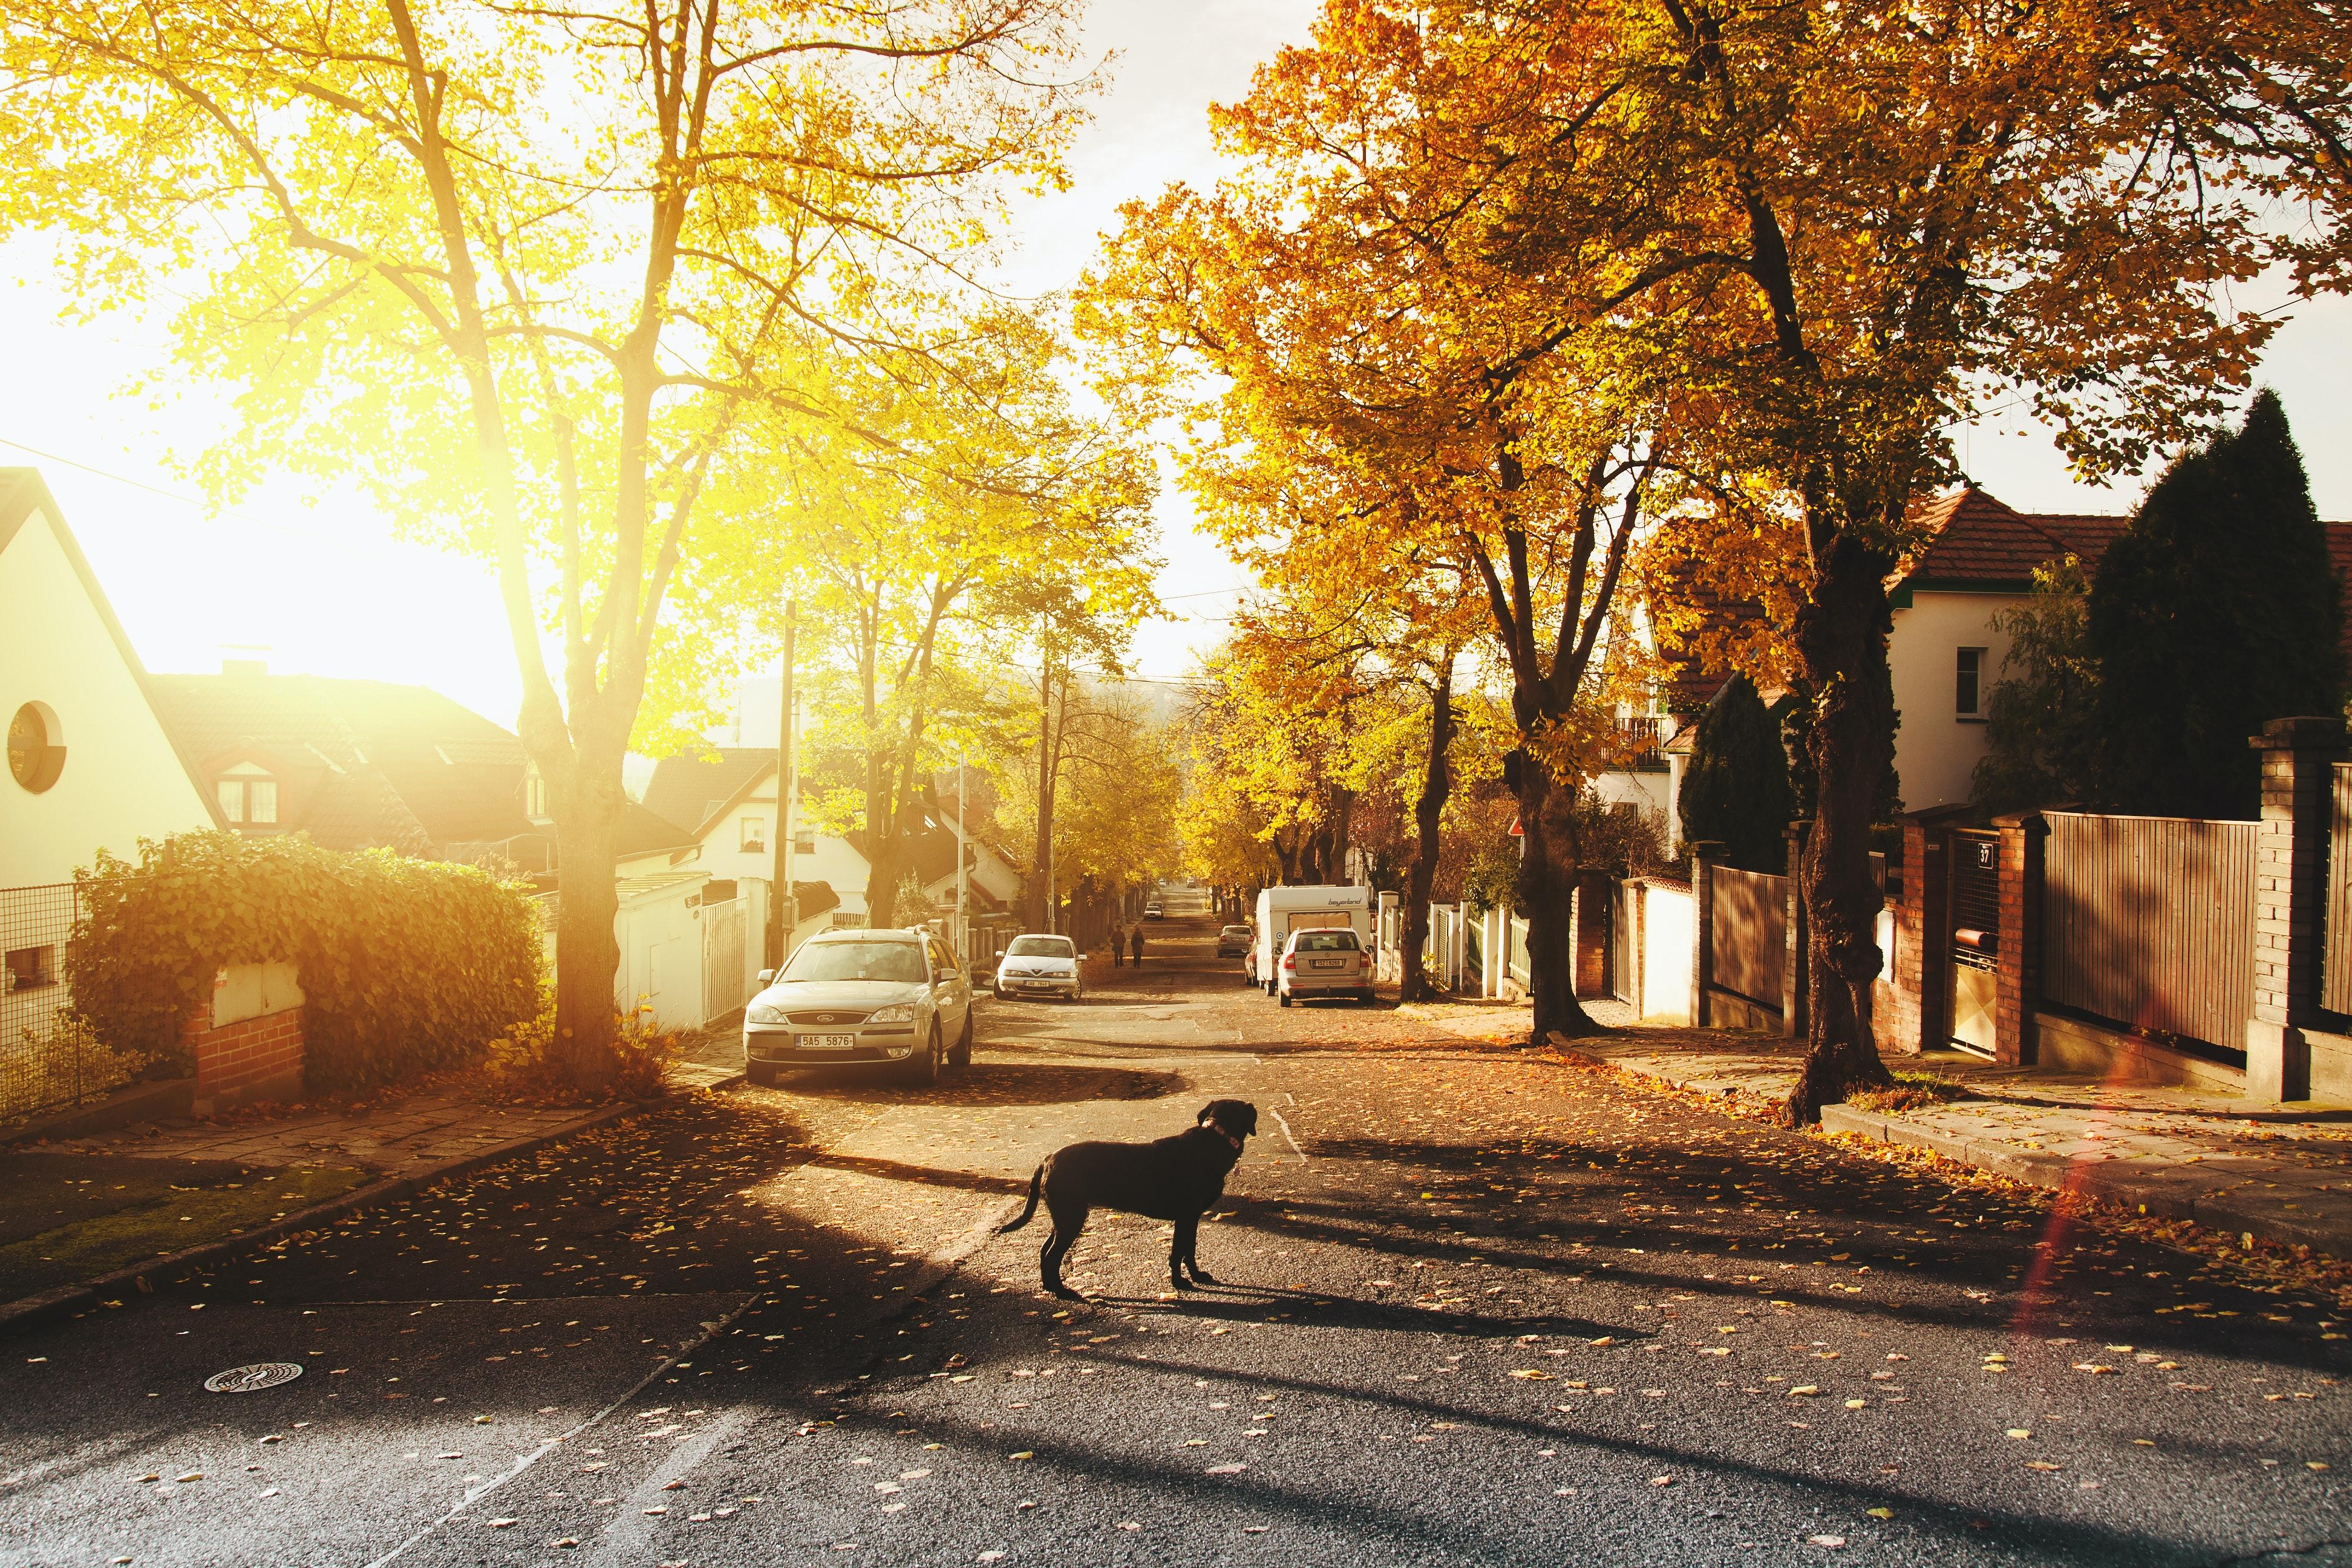 Affluent Suburban Neighborhood